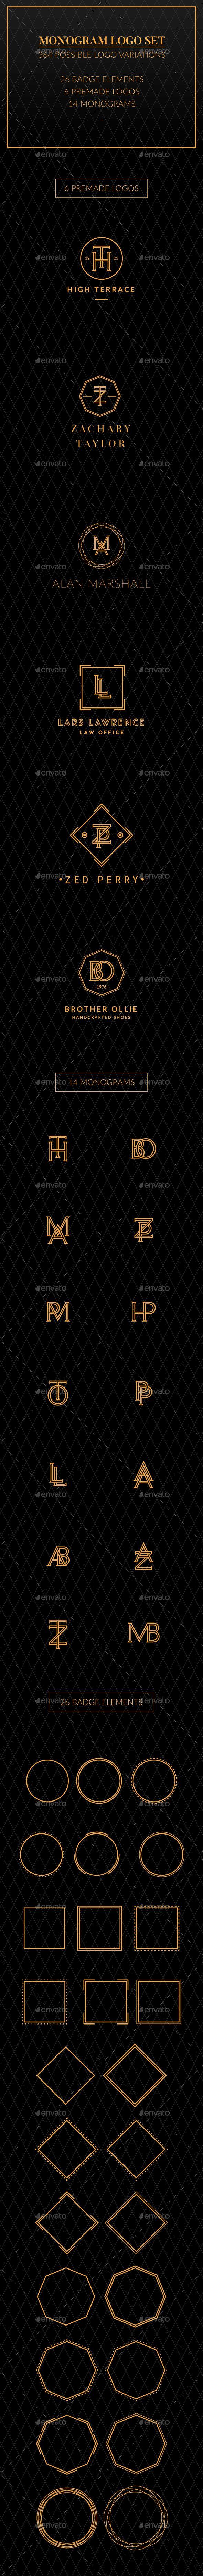 Monogram logo Template Vector EPS, AI Set. Download here: http ...